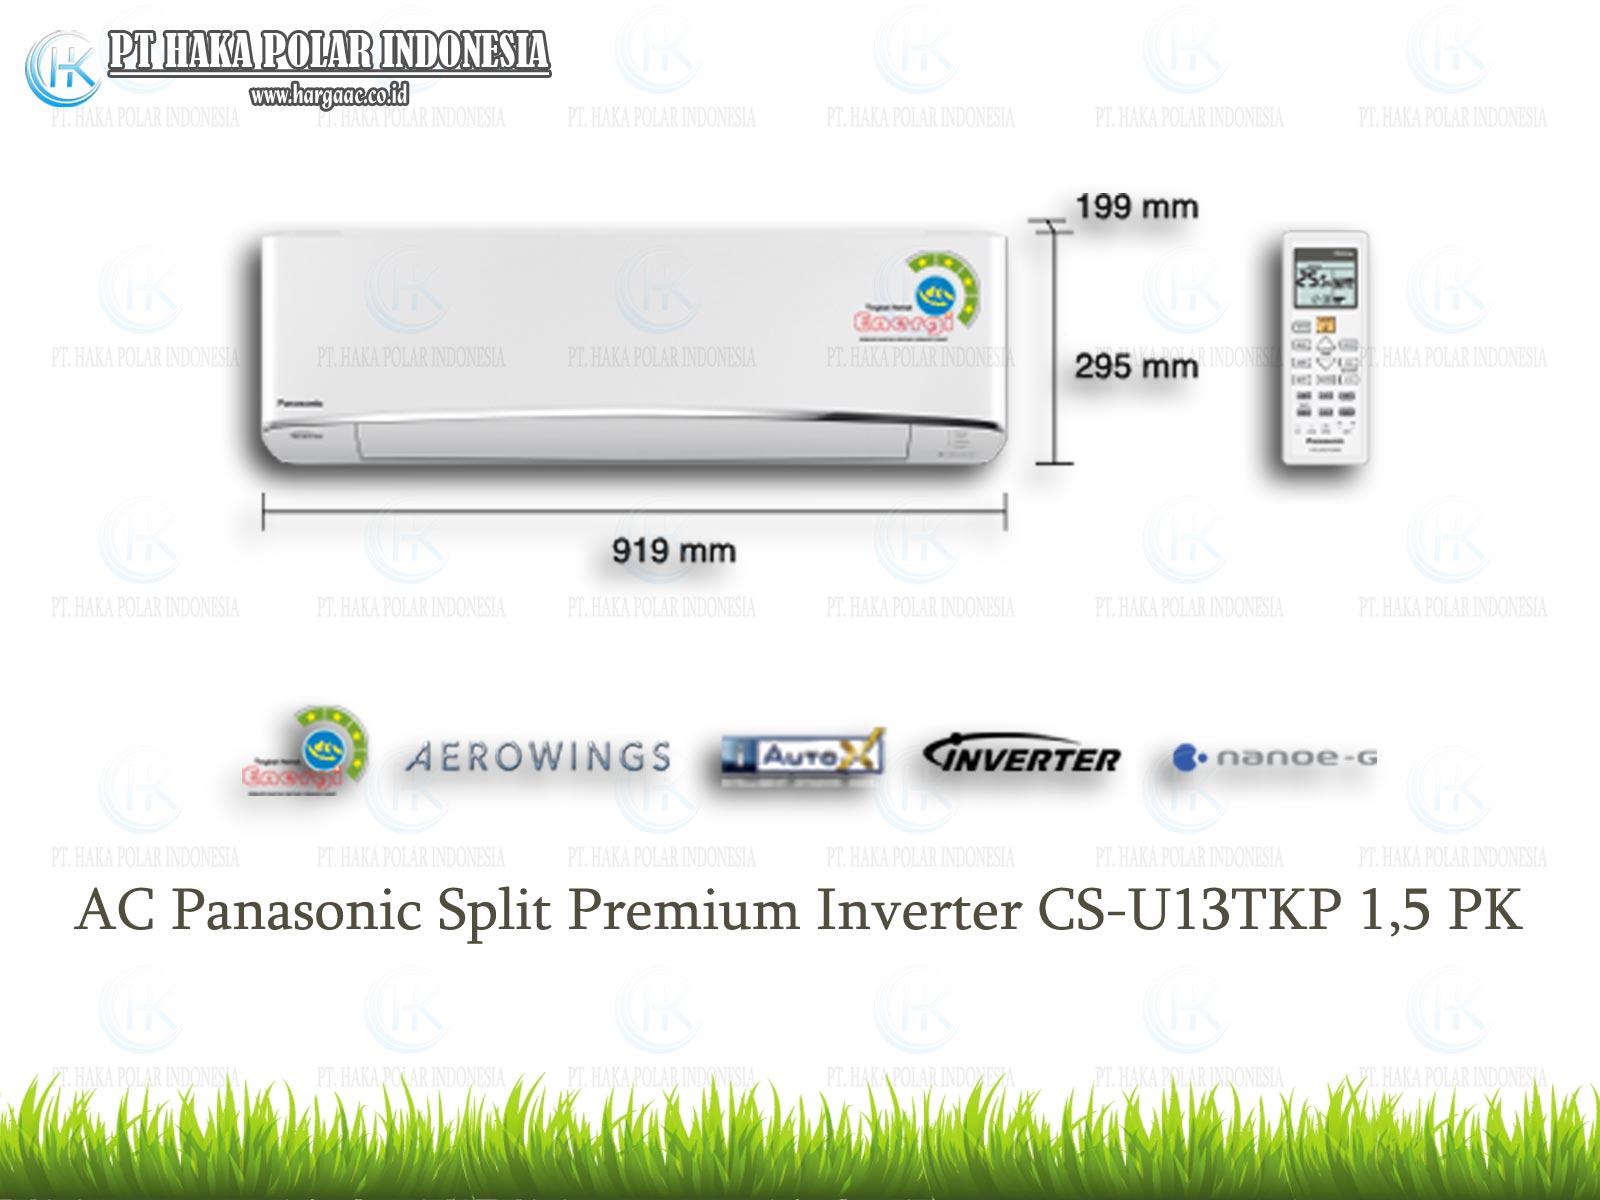 AC Panasonic Split Premium Inverter AERO Series CS U13TKP 15 PK